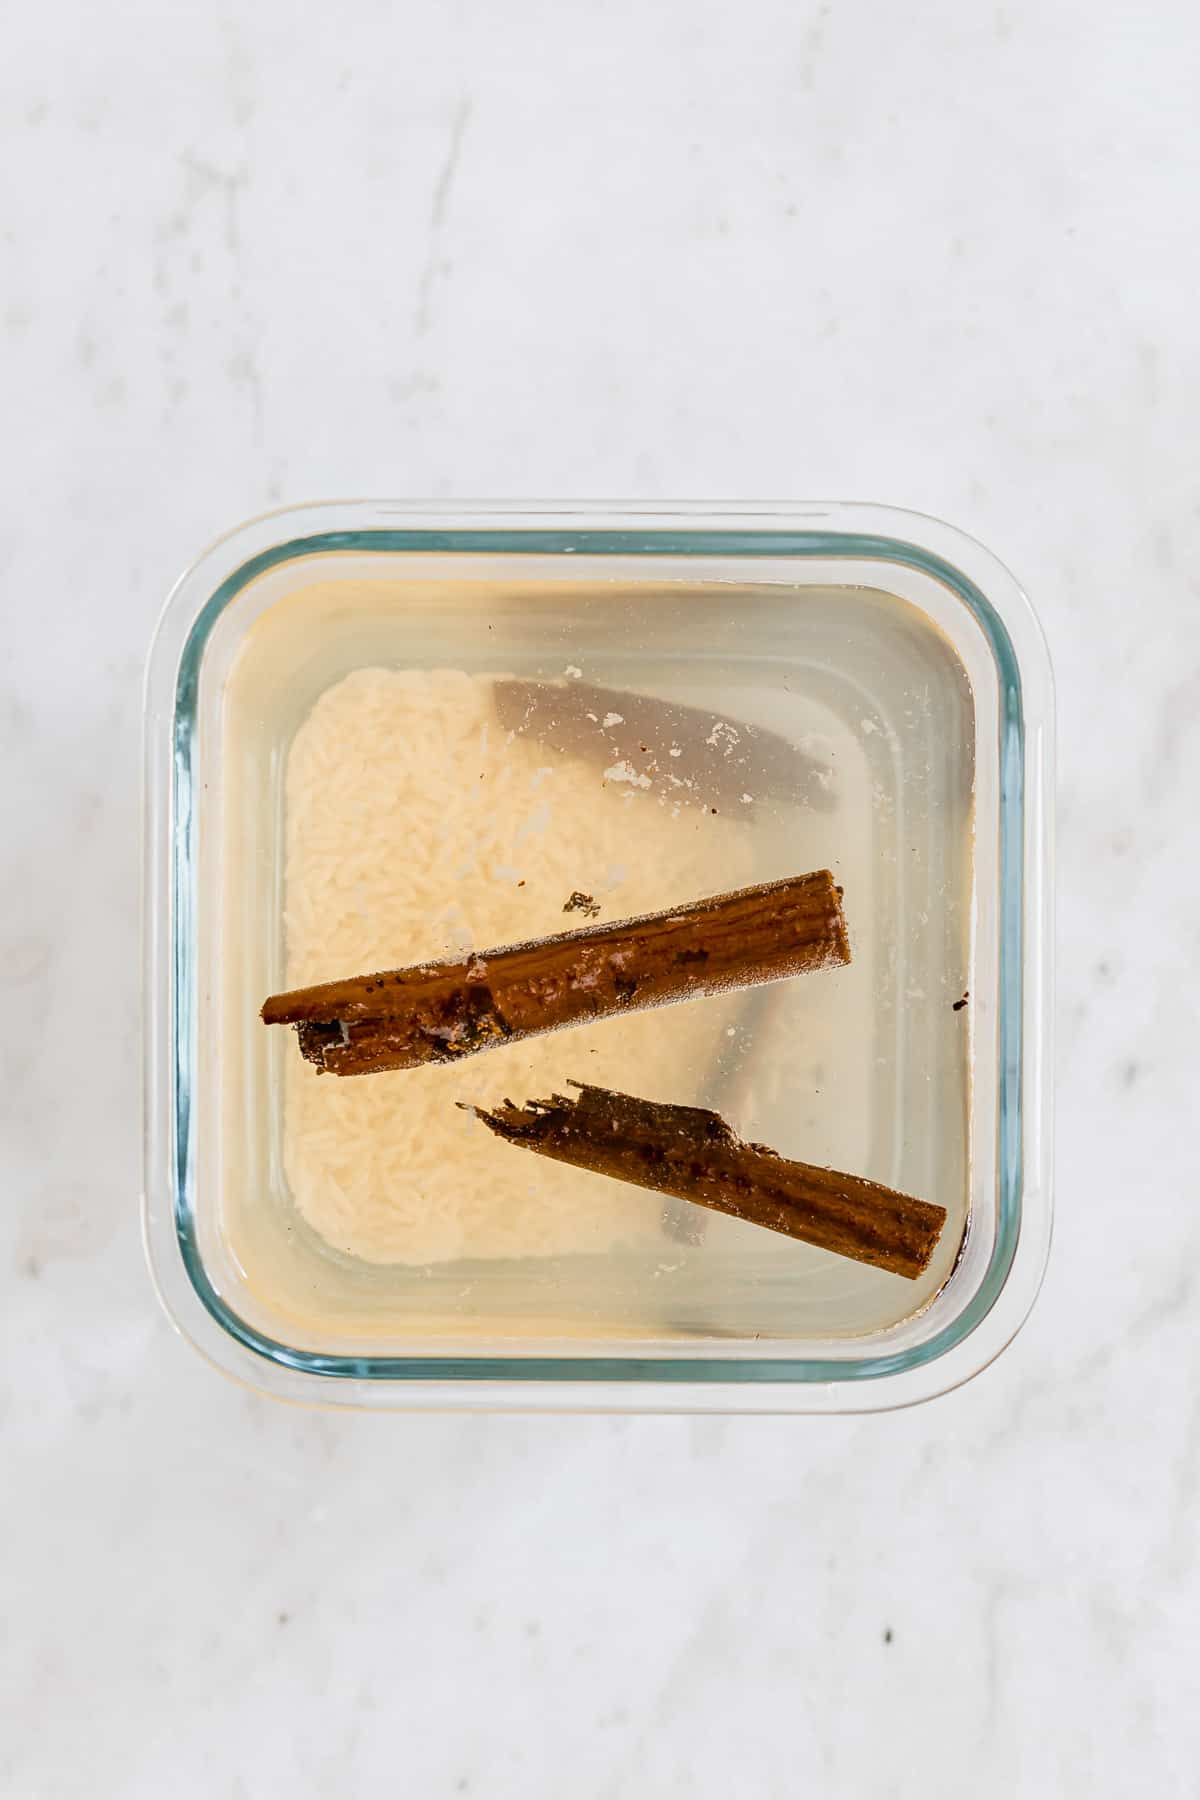 horchata rezept schritt 1